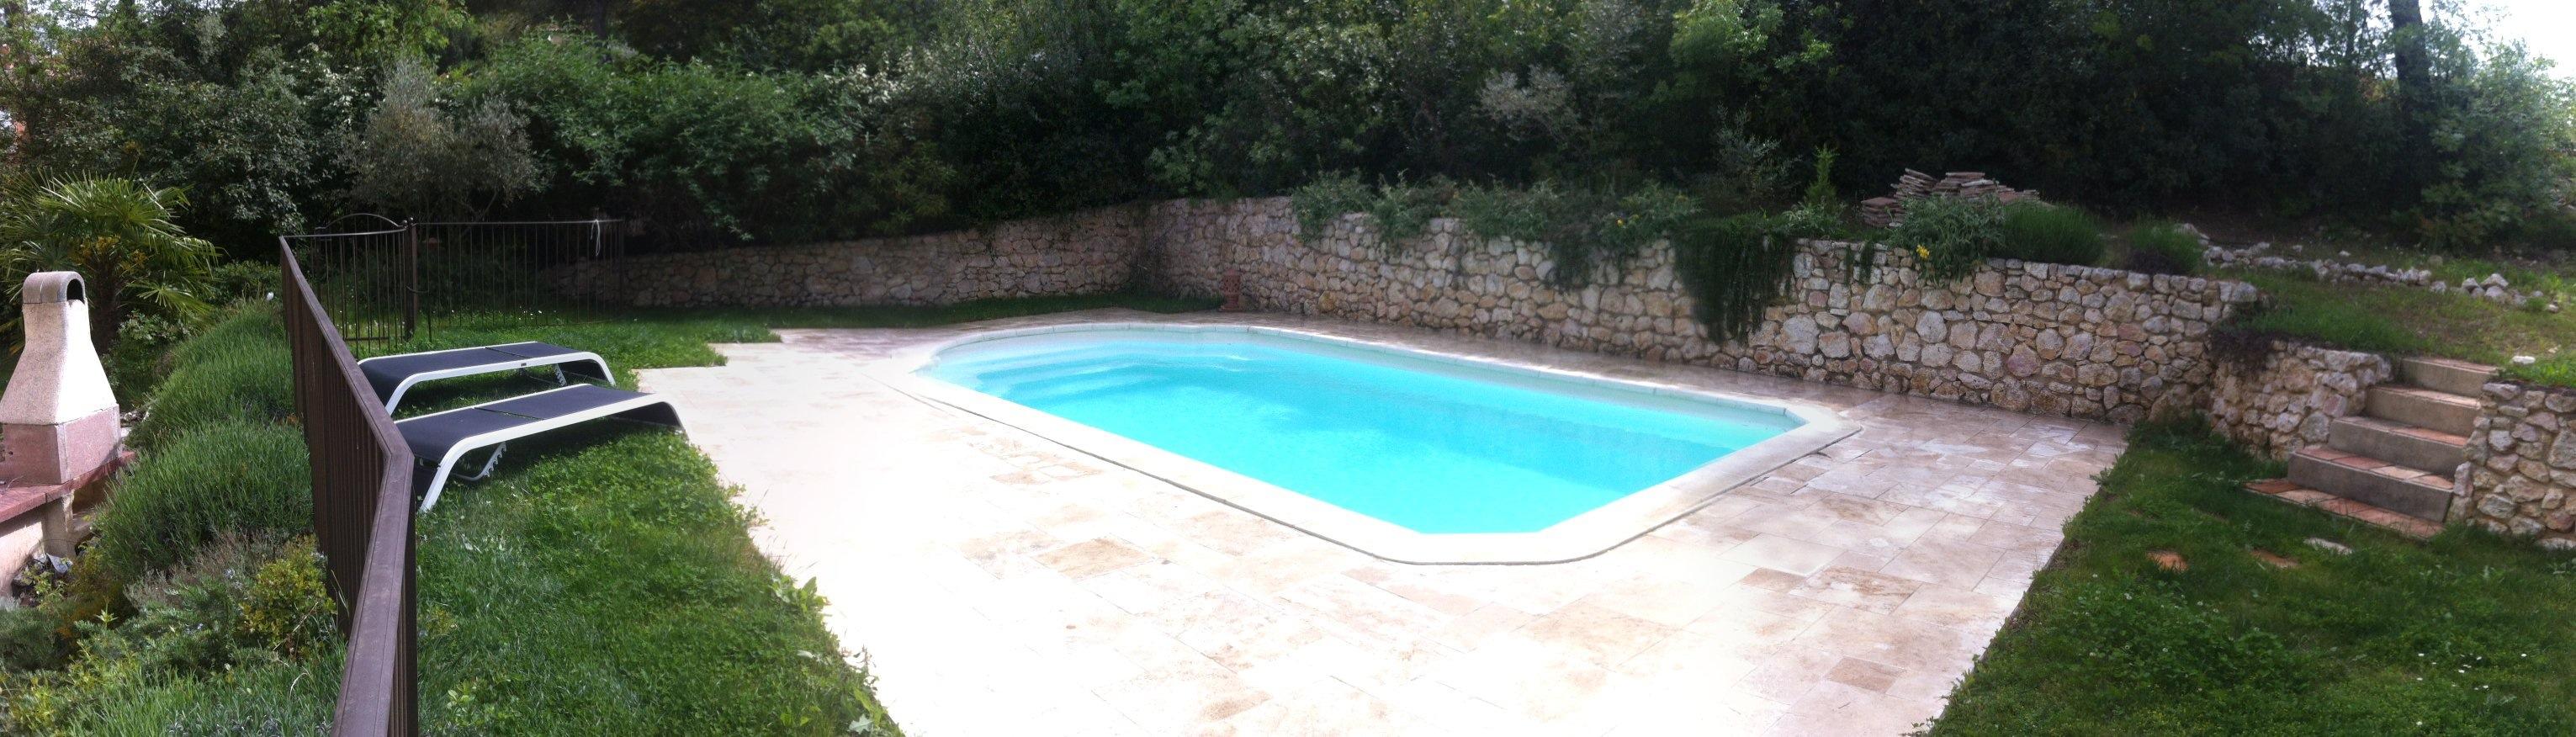 contour de piscine en pierre